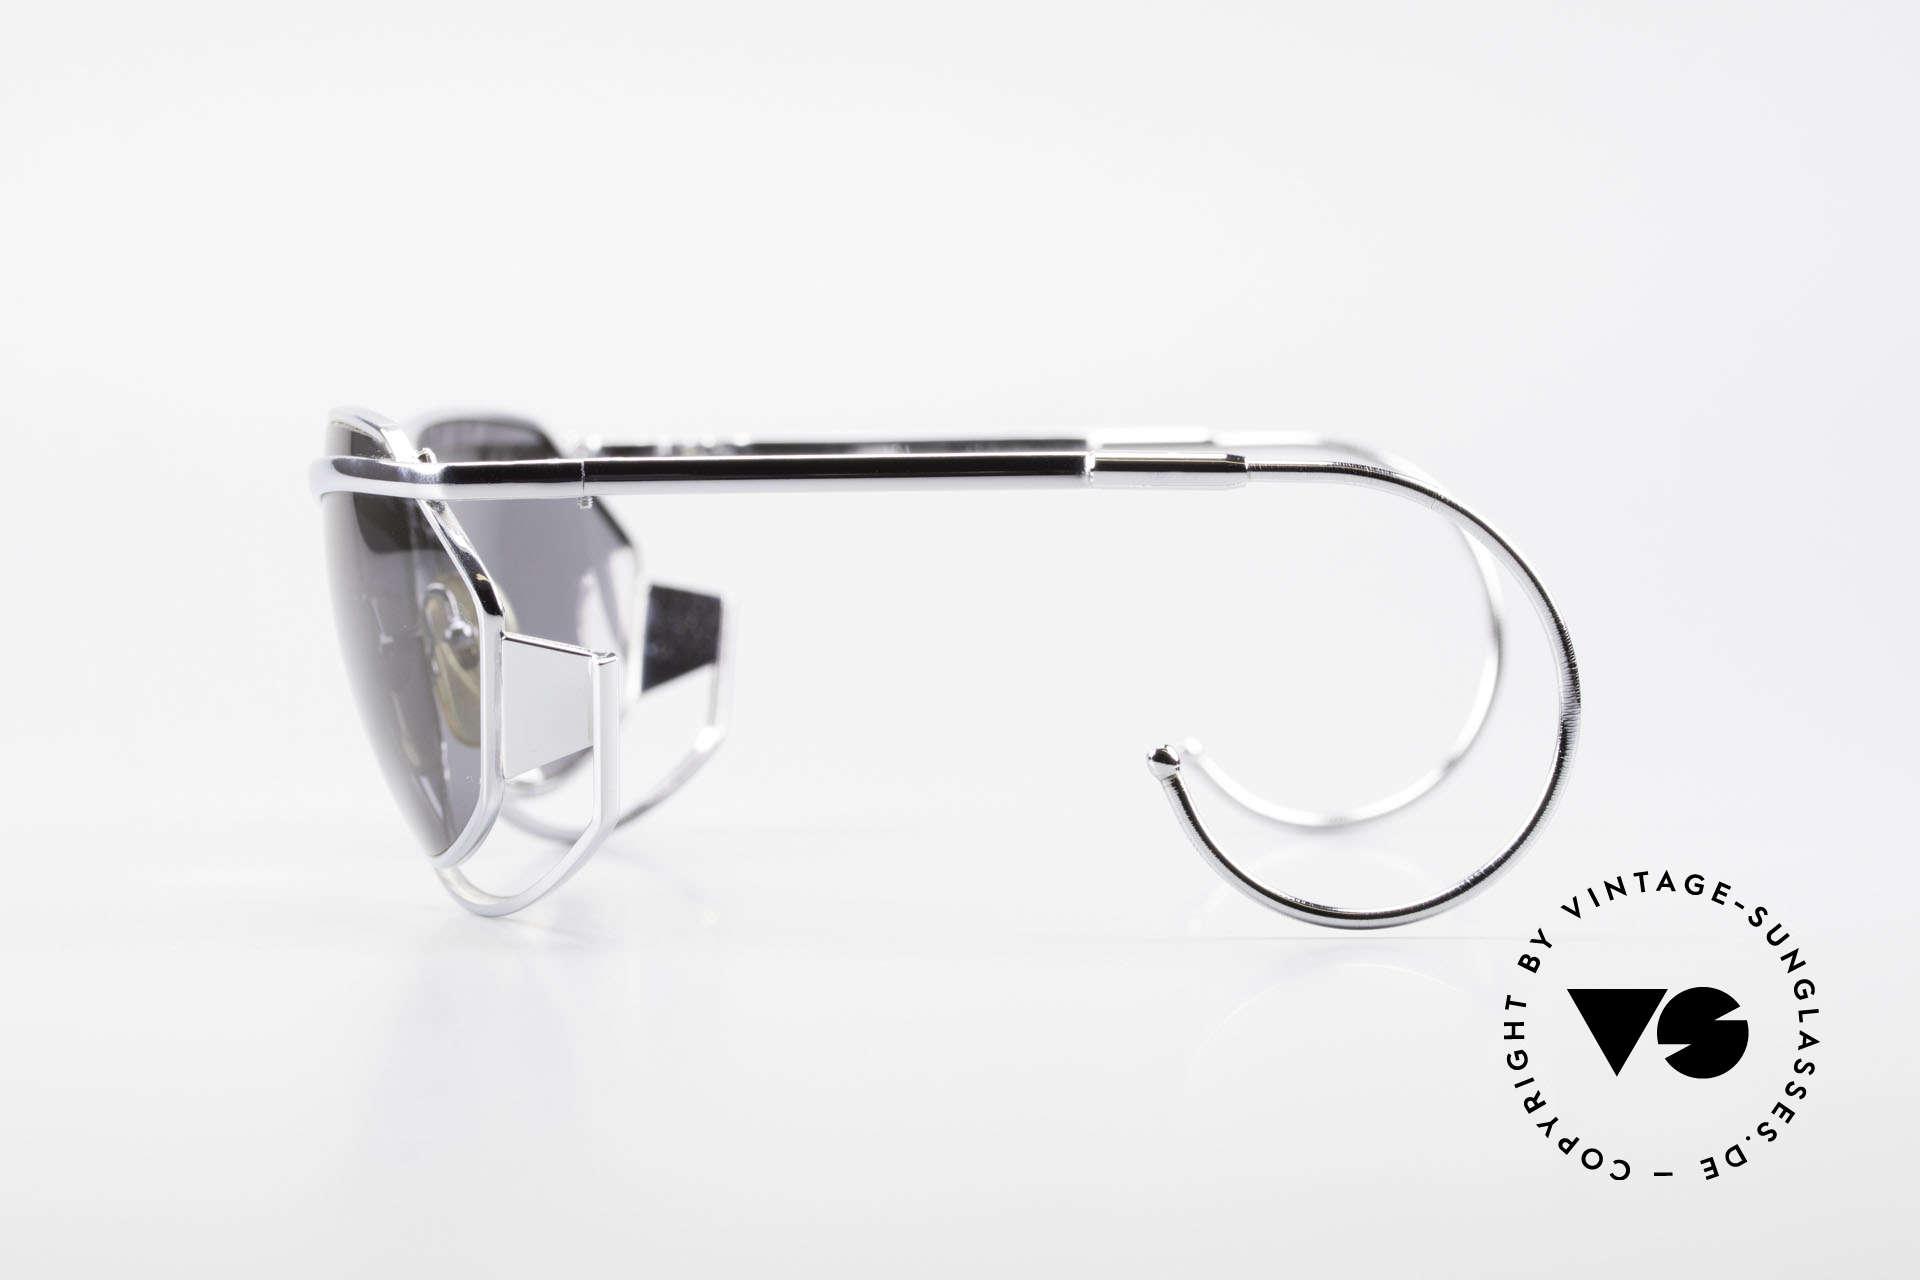 IDC G1 Folding Large Folding Sunglasses 90's, with ingenious foldable bridge & flexible sport temples, Made for Men